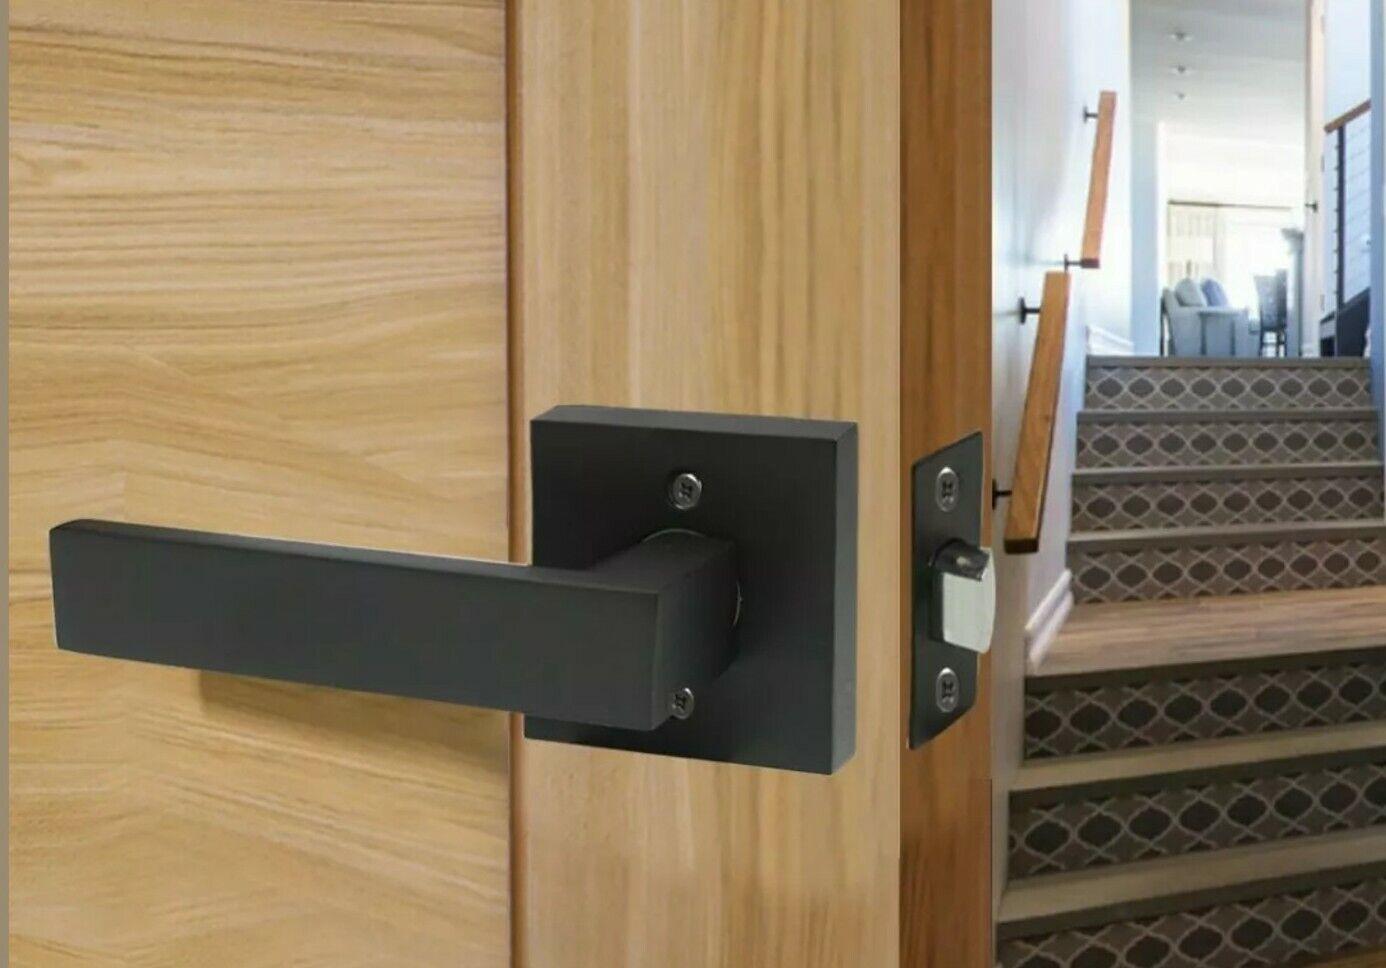 Passage Door Lever Handle Interior Non Locking Lever Set For Hallway Only 1 Set For Sale Online